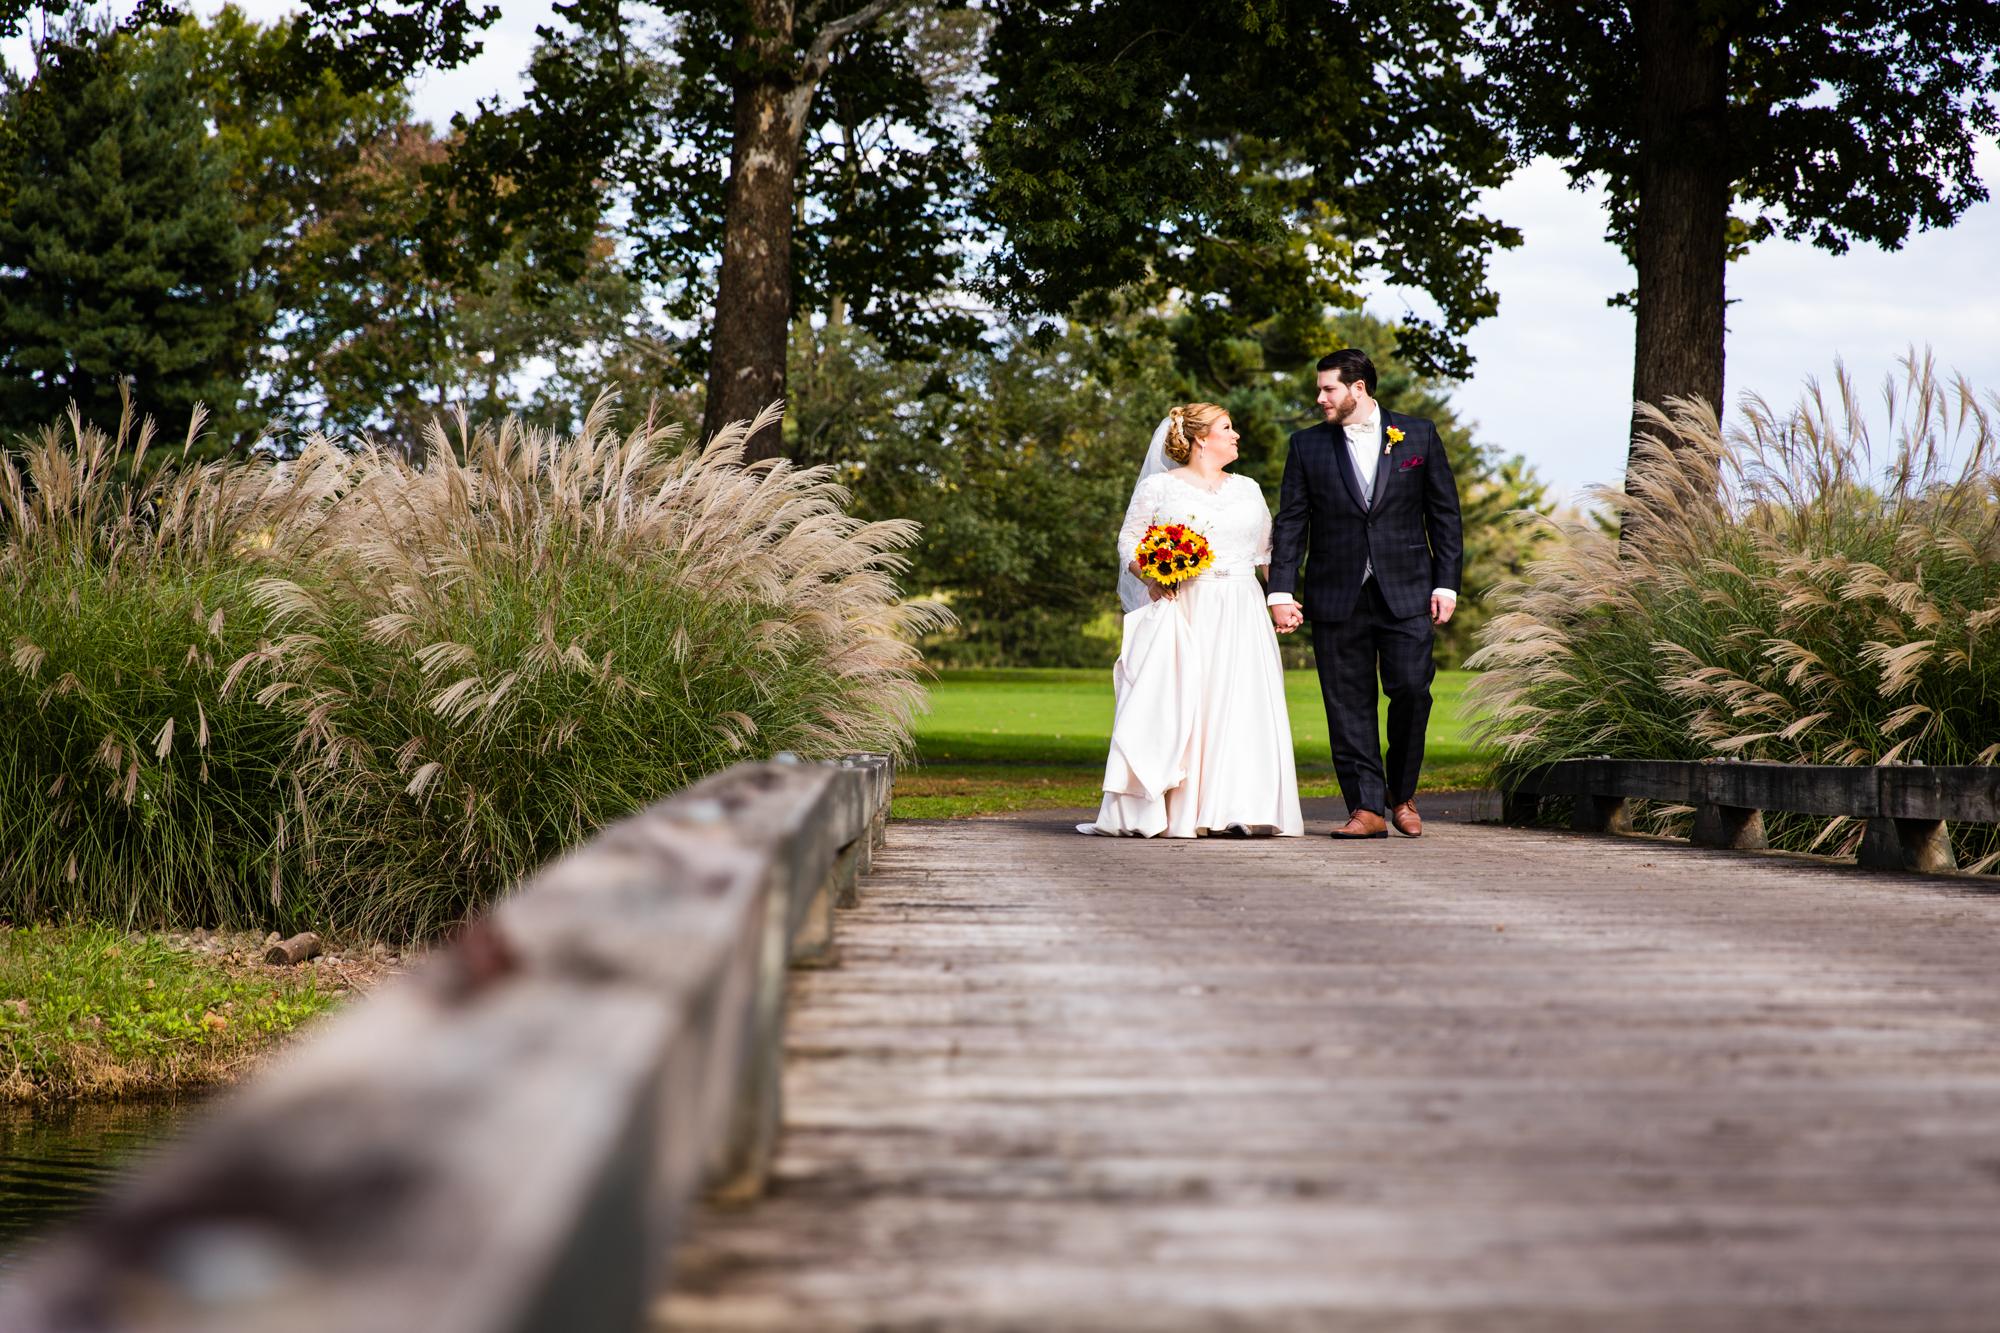 Cedar Brook Country Club Wedding Photography - Lovestruck Pictures-037.jpg